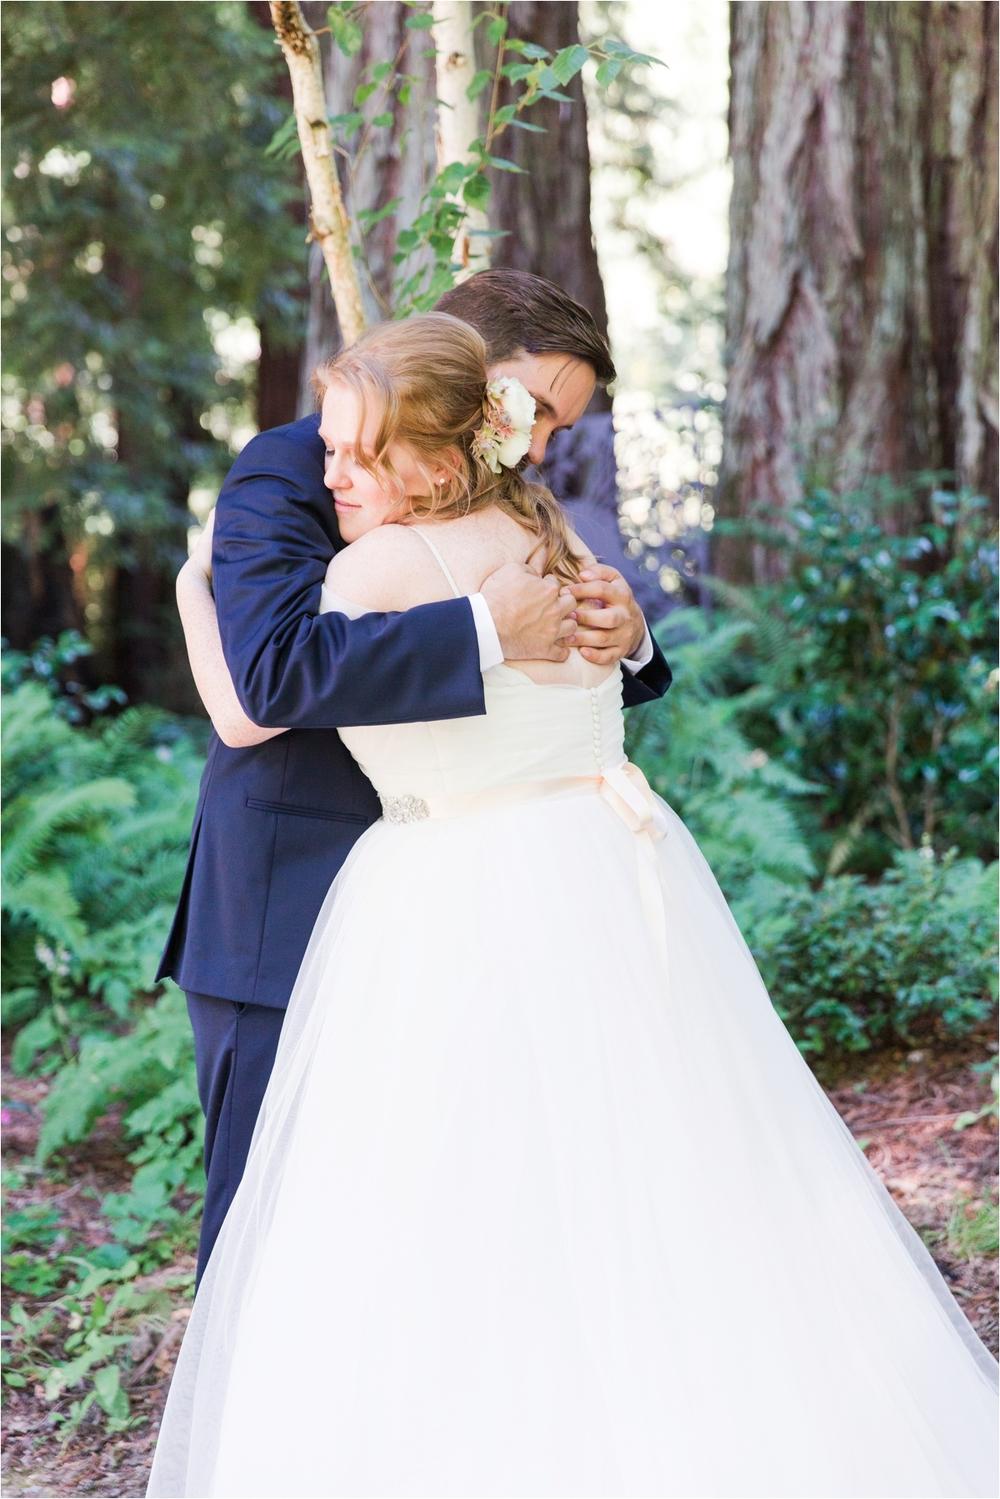 Nestldown wedding Photos by Briana Calderon Photography_0181.jpg